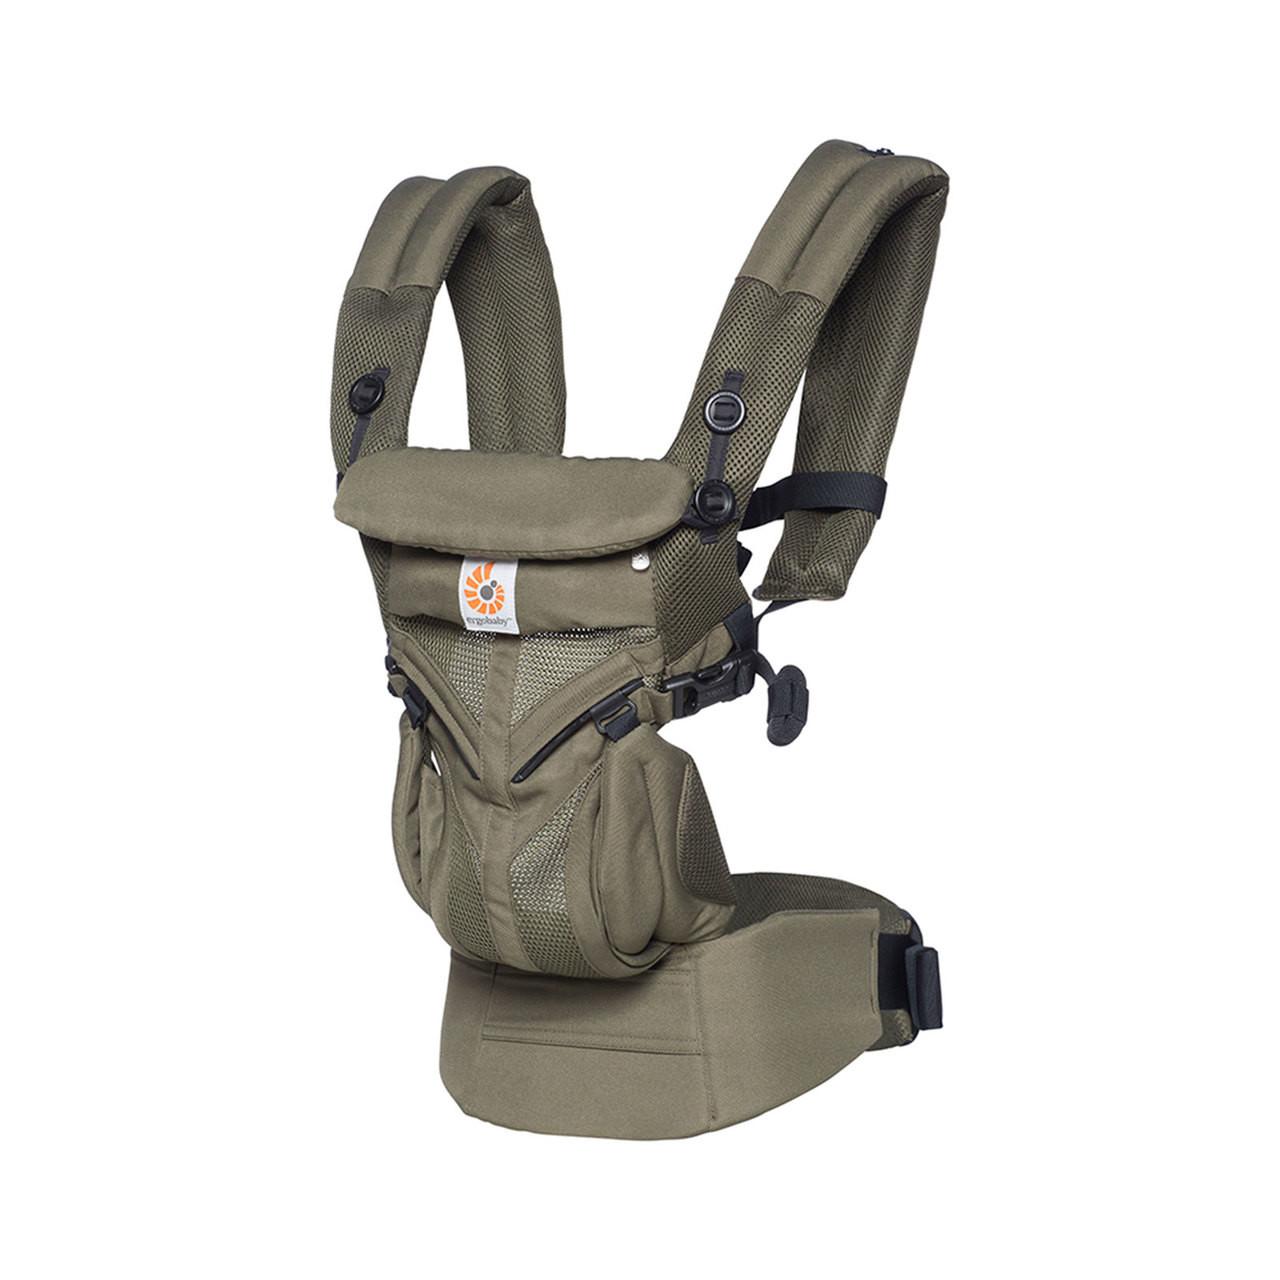 ea4dea05639 Buy Ergobaby Omni 360 Cool Air Mesh Baby Carrier Khaki Green